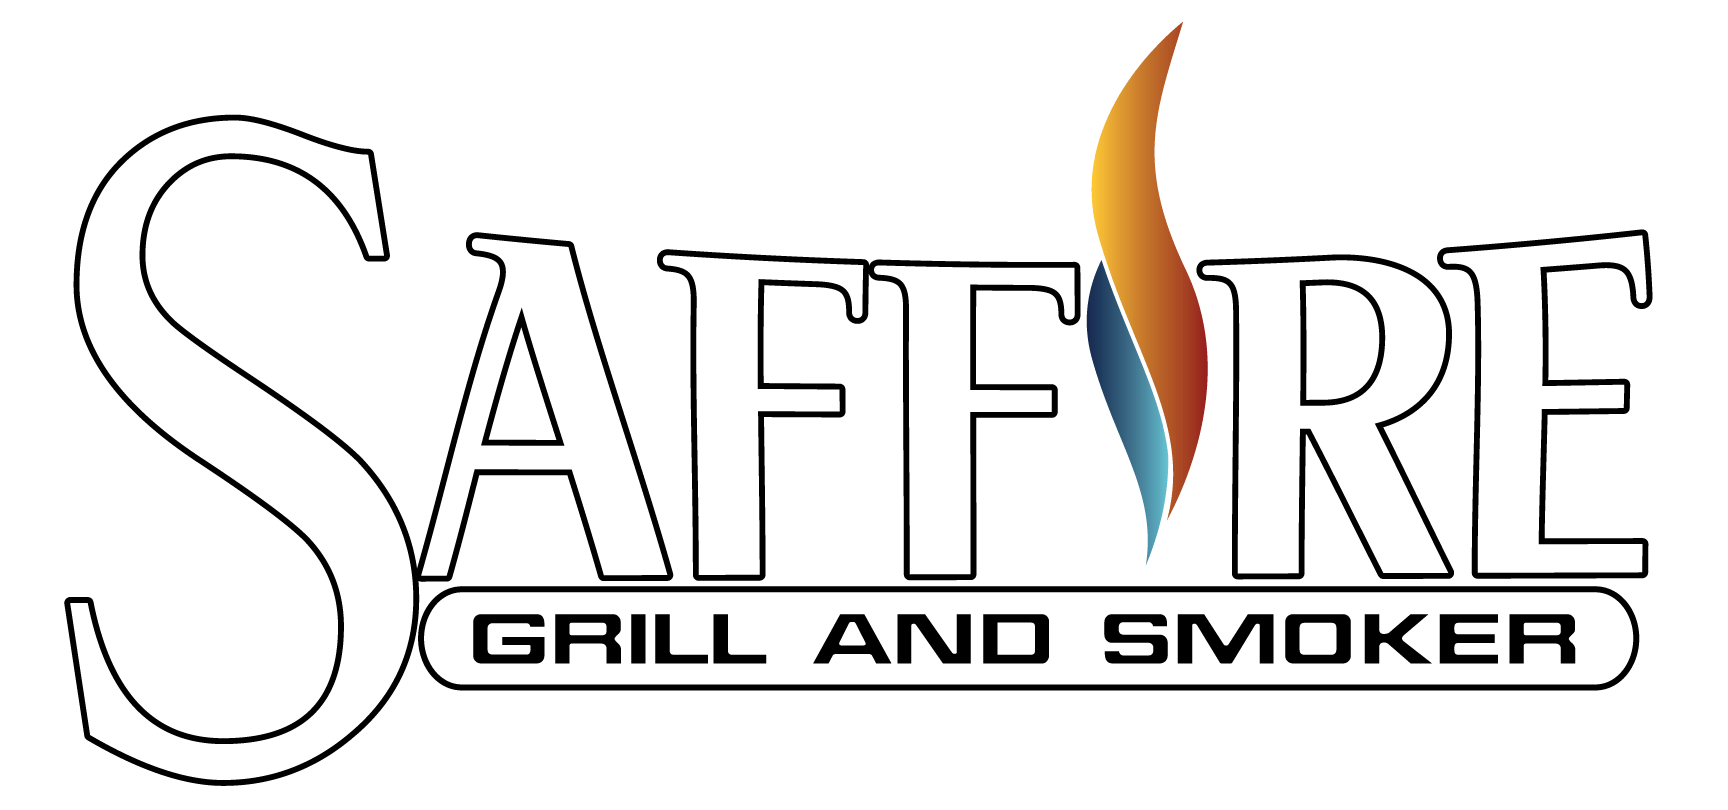 Saffire Grills